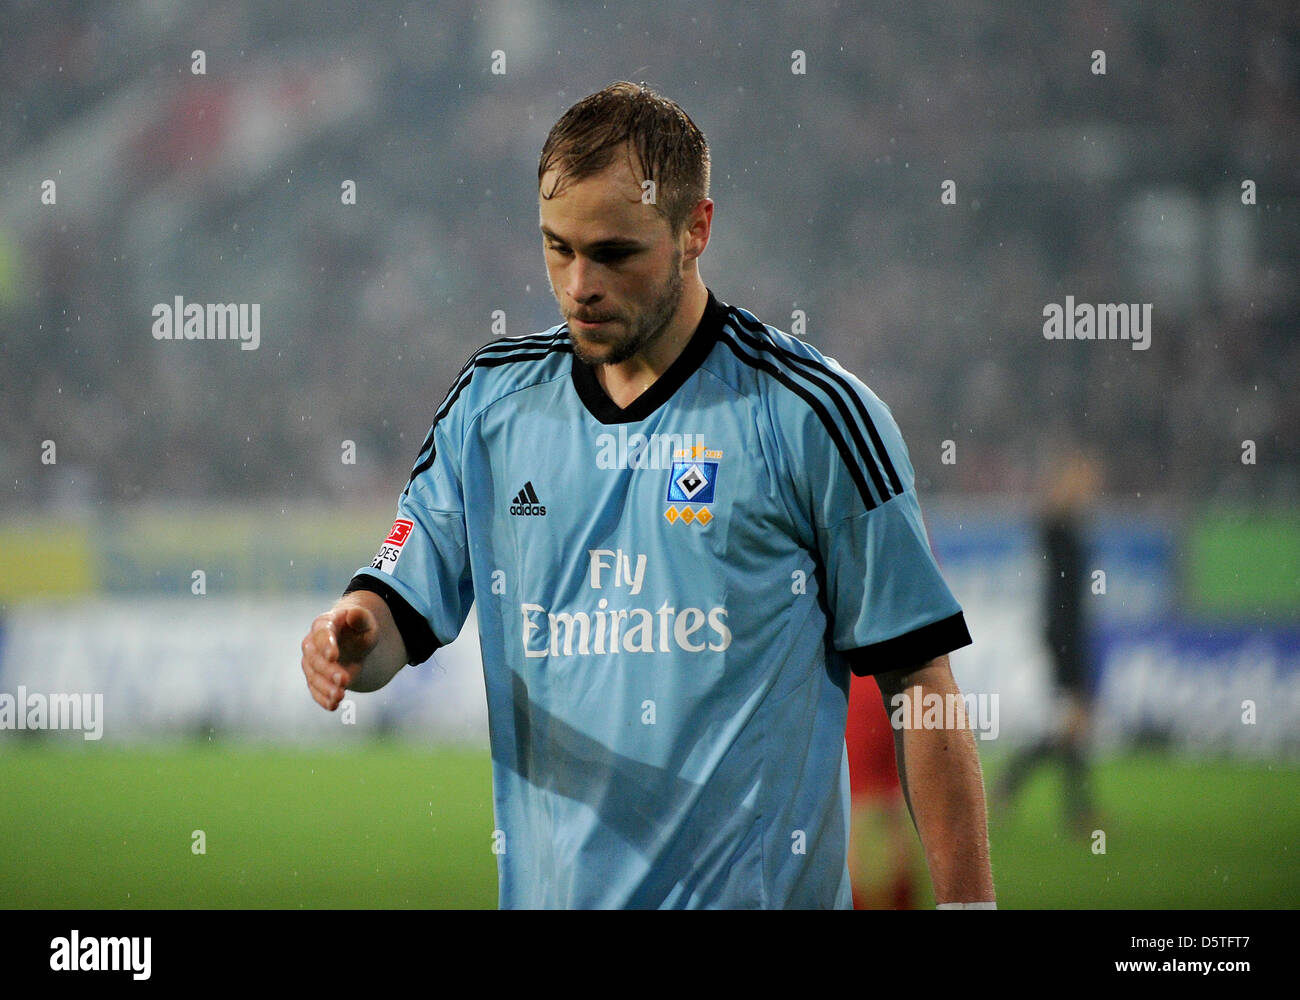 Hamburg's  Maximilian Beister gestures during the German Bundesliga soccer mathc between Fortuna Duesseldorf - Stock Image